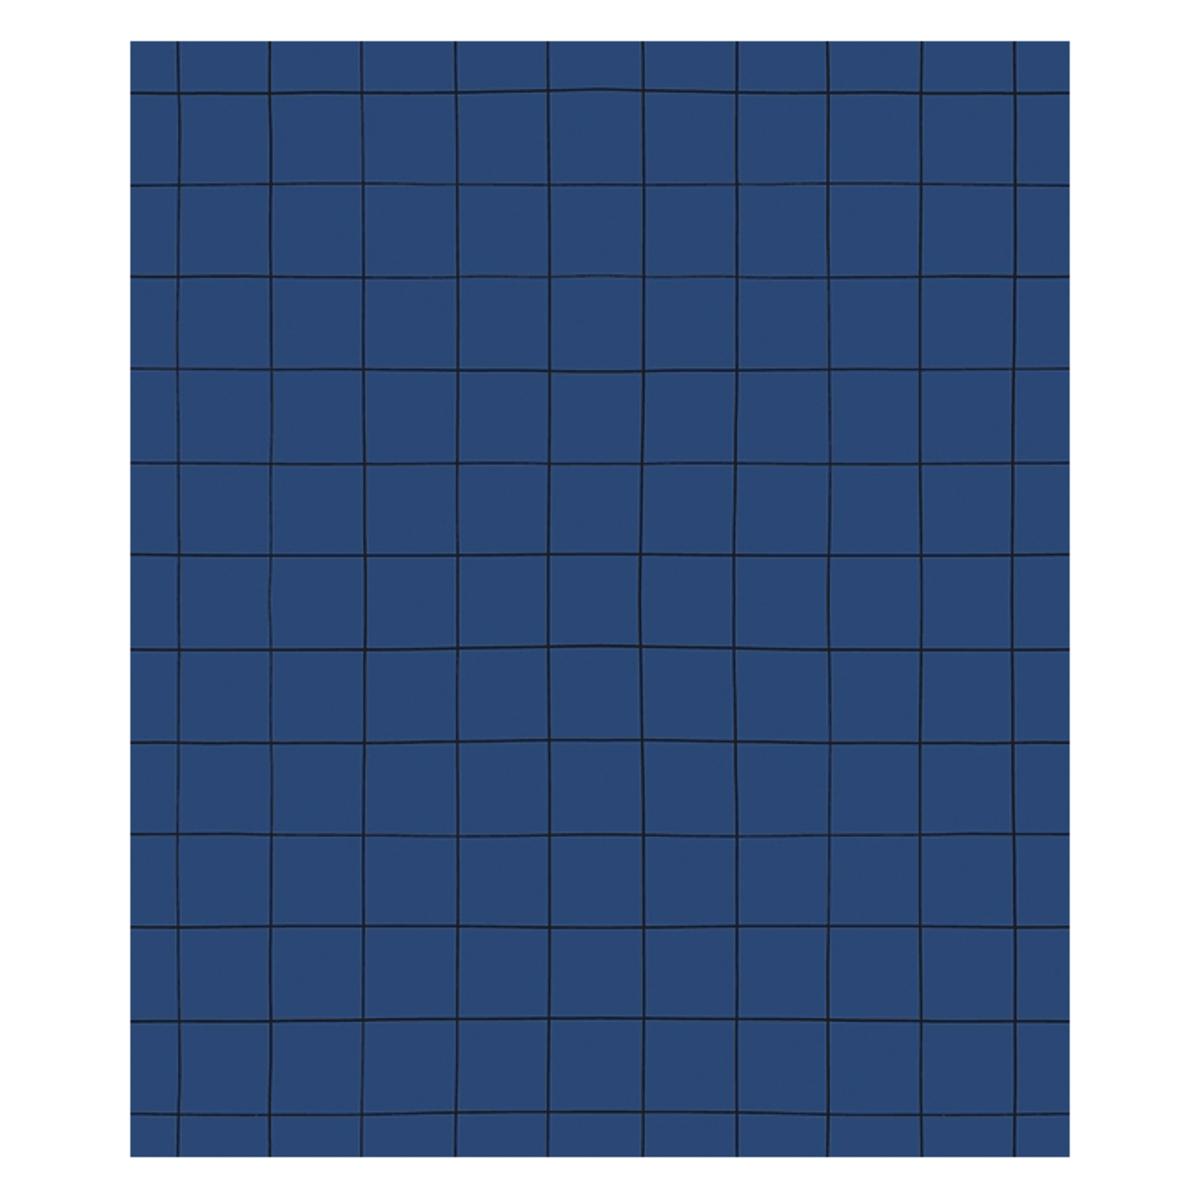 Papier peint Papier Peint Minima - Bleu Marine et Quadrillage Papier Peint Minima - Bleu Marine et Quadrillage